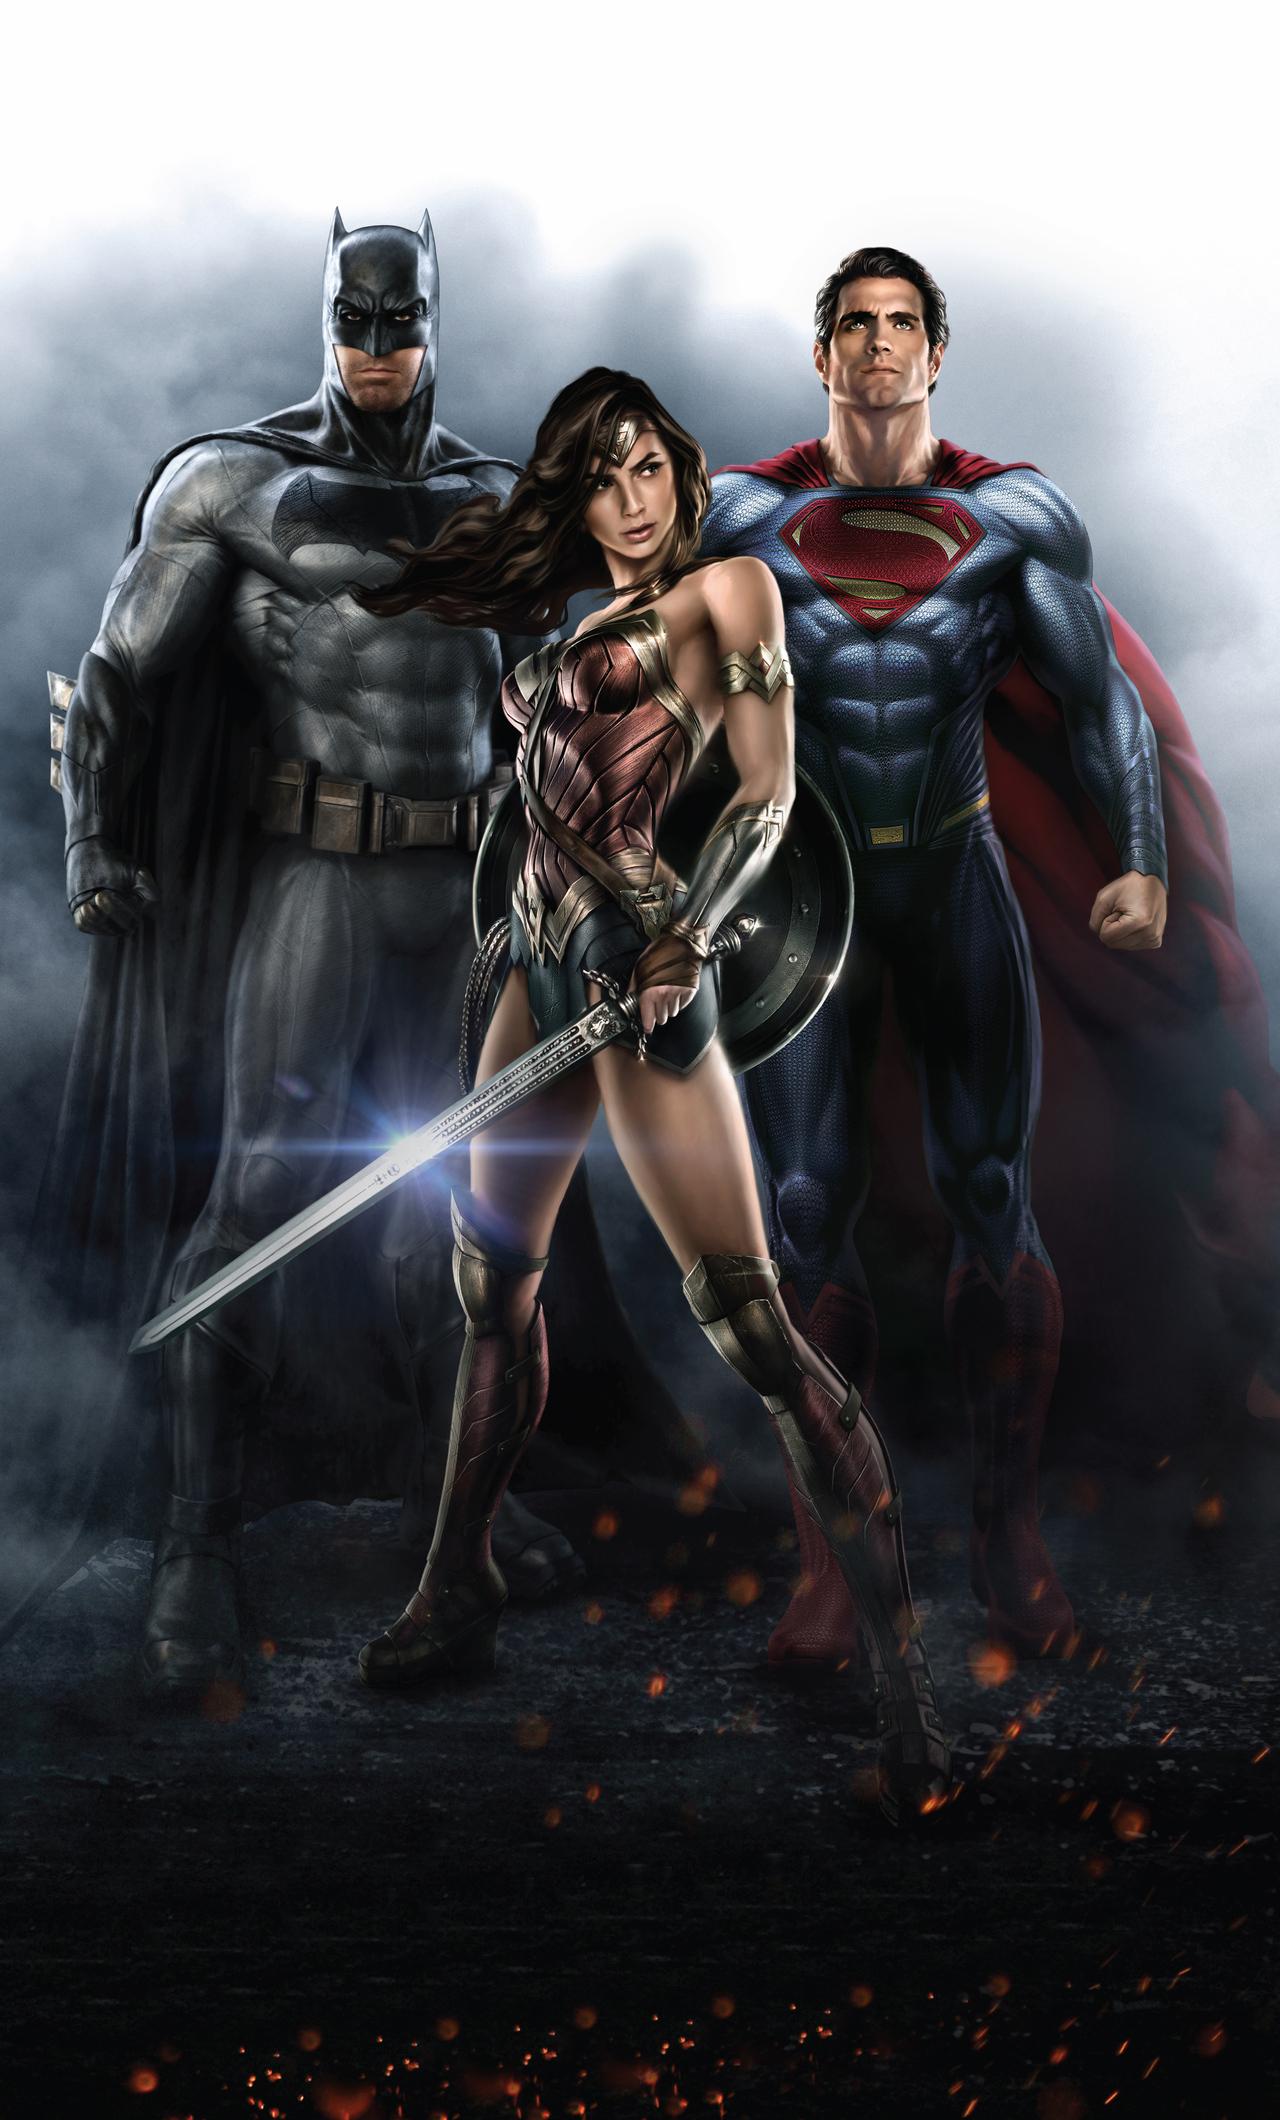 1280x2120 Batman Wonder Woman Superman 4k Iphone 6 Hd 4k